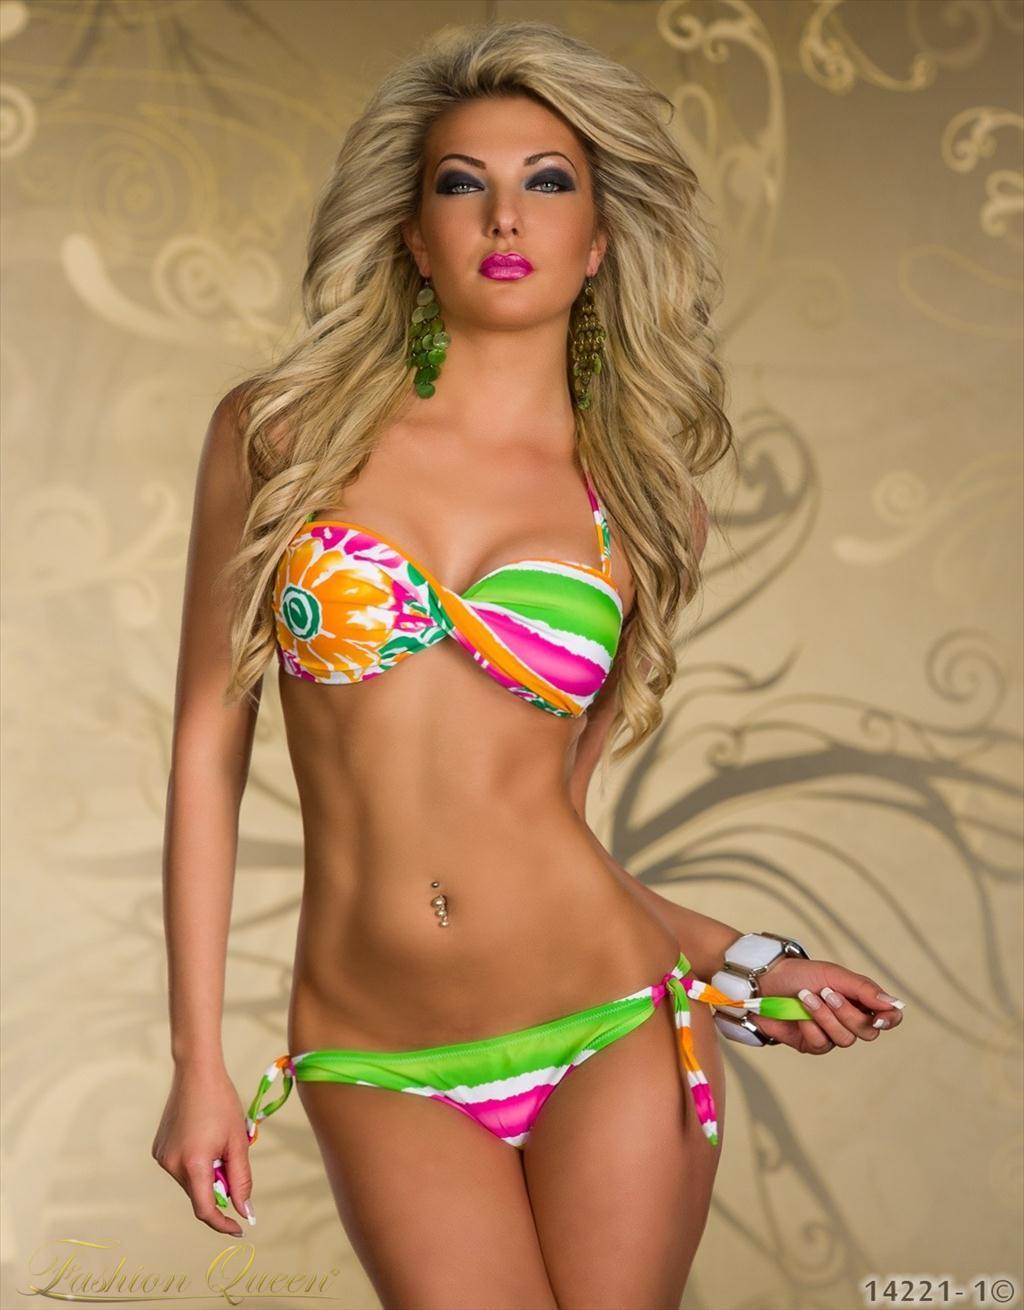 fe053d518 Fashion Queen - Dámske oblečenie a móda - Plavky